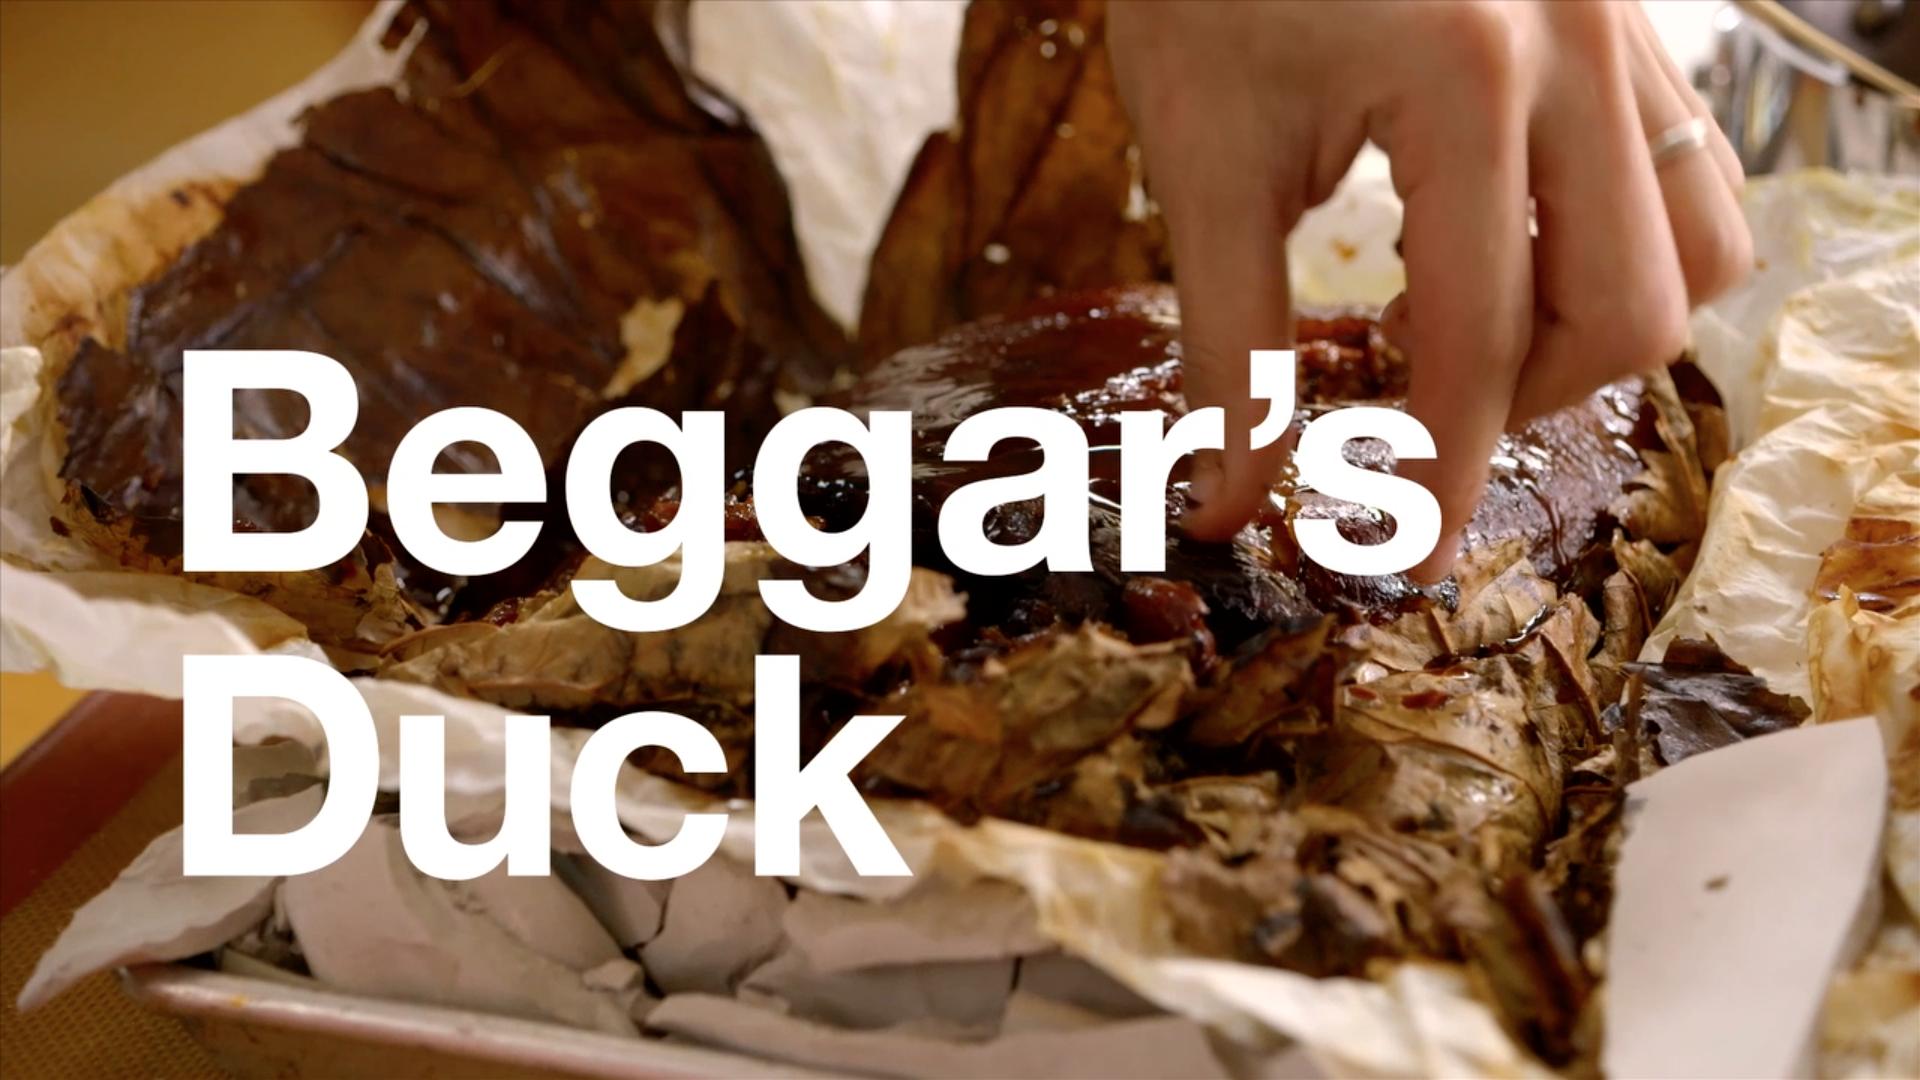 Danny-Bowien-Beggars-Duck.png